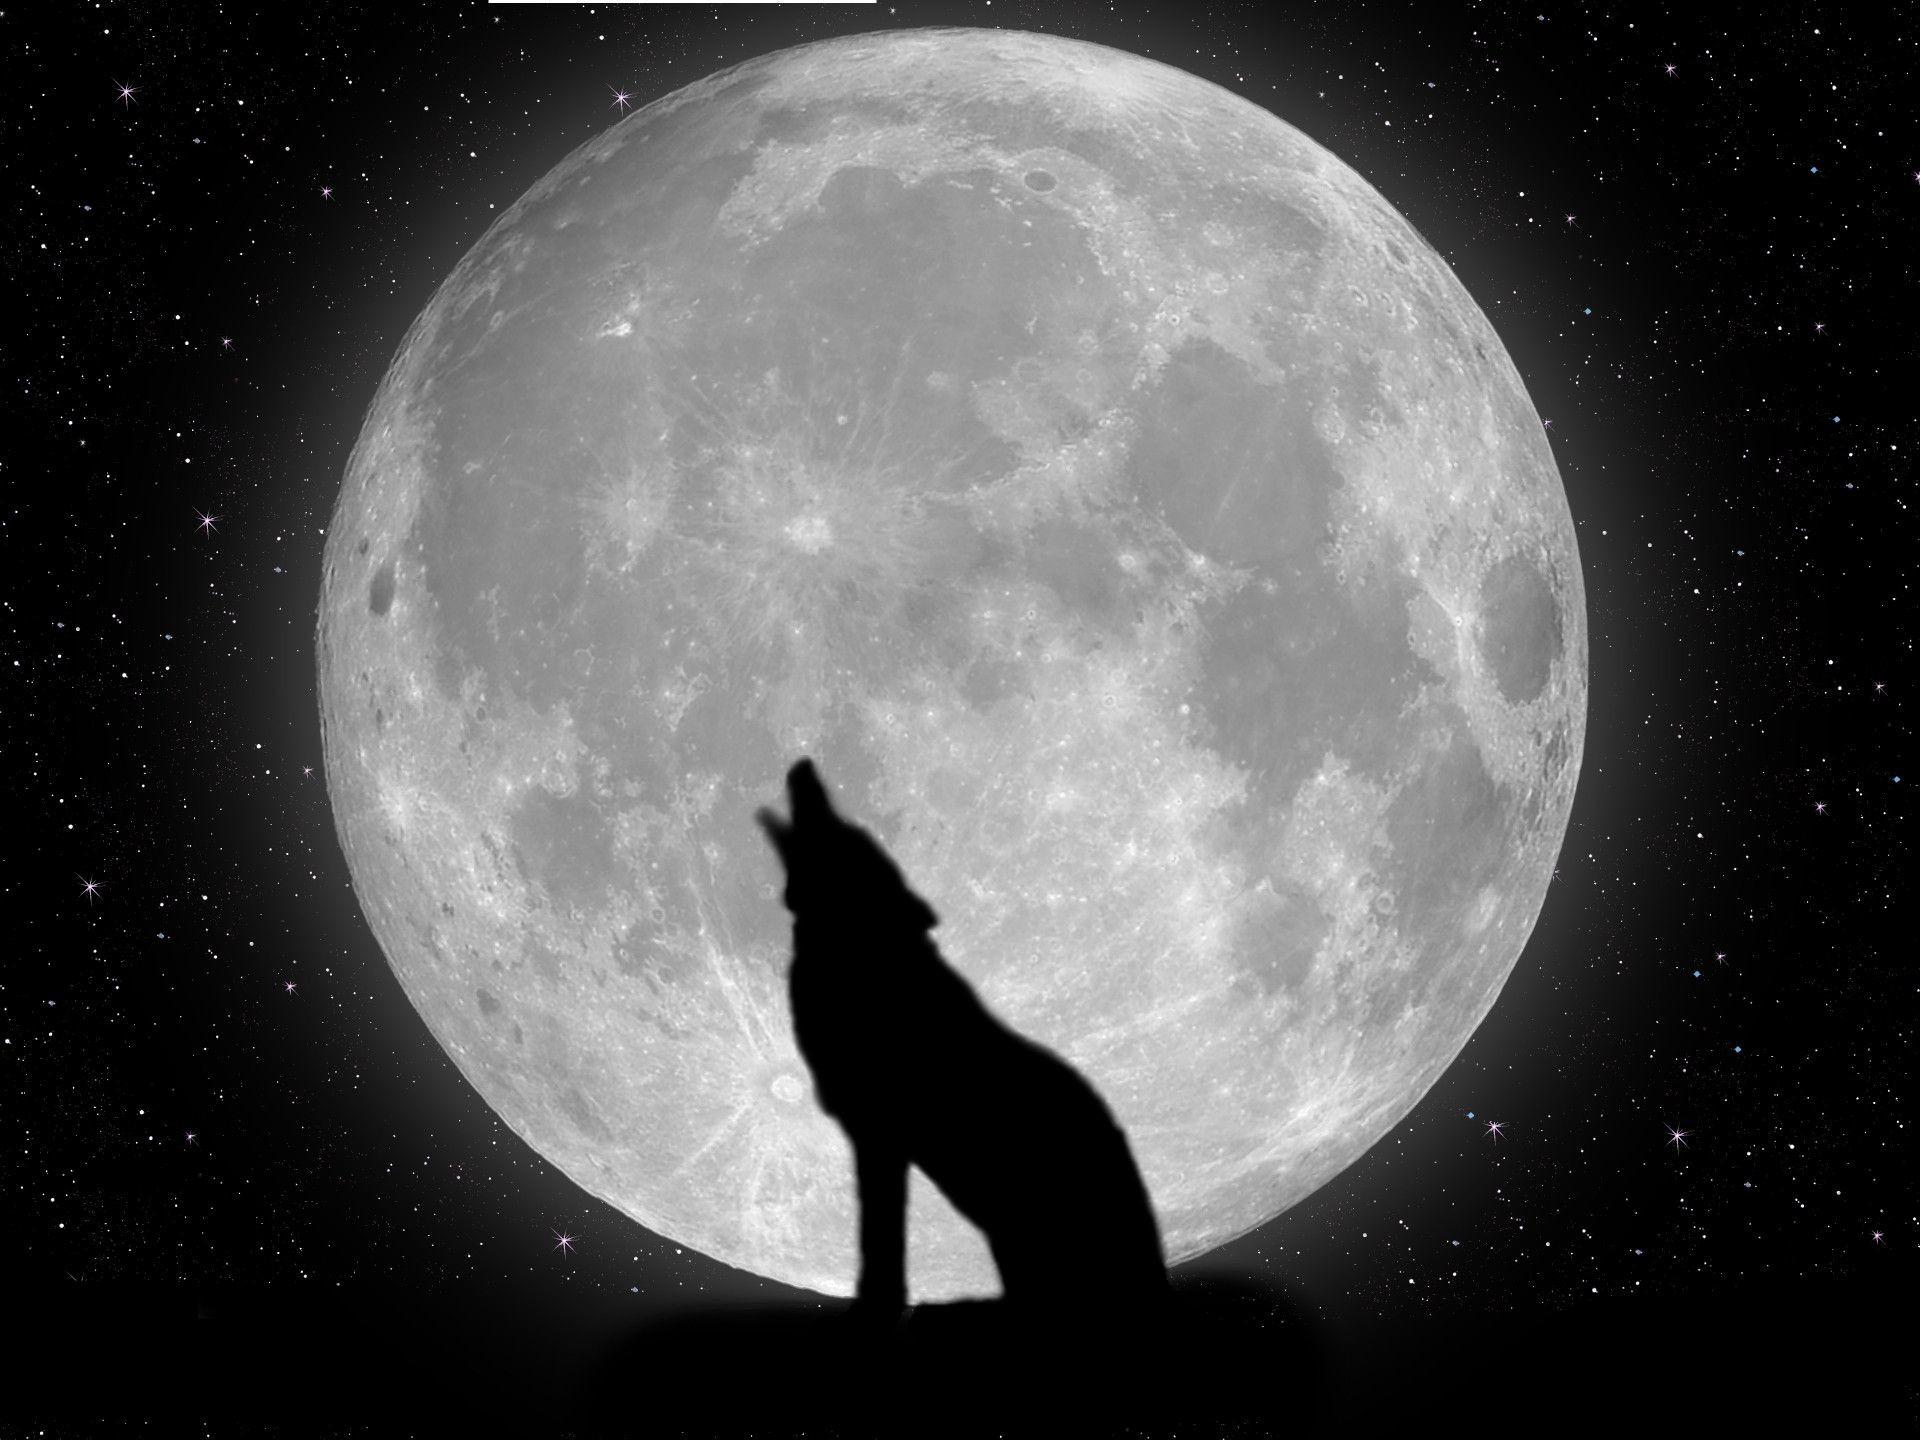 Lone Wolf Wallpaper 1280×1024 Lone Wolf Wallpapers (38 Wallpapers) |  Adorable Wallpapers | Desktop | Pinterest | Wolf wallpaper, Wallpaper and  Fantasy wolf